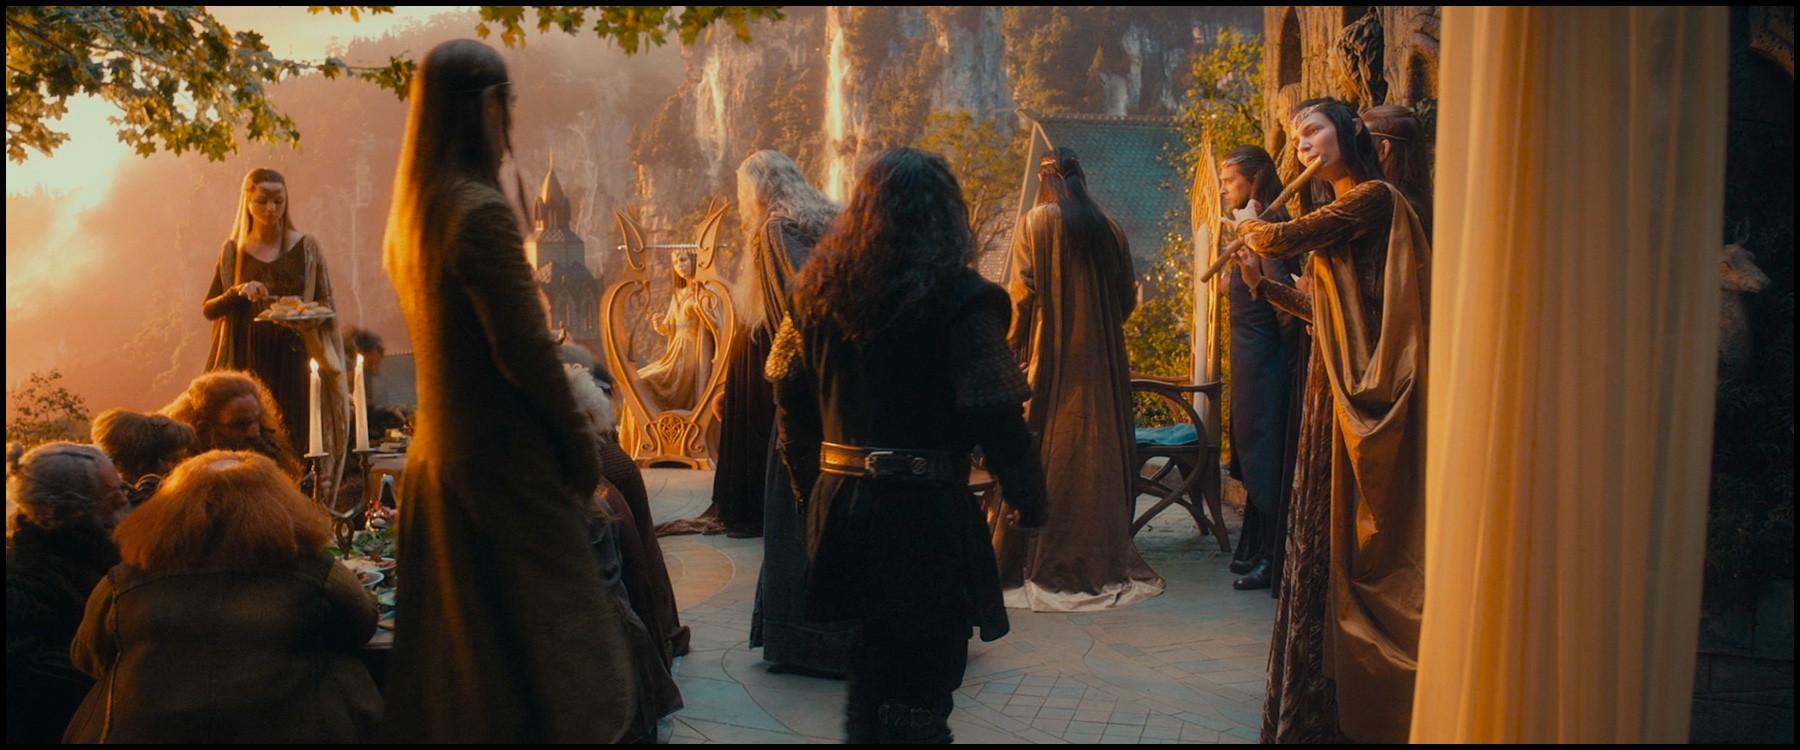 Daniel bayona hobbit16